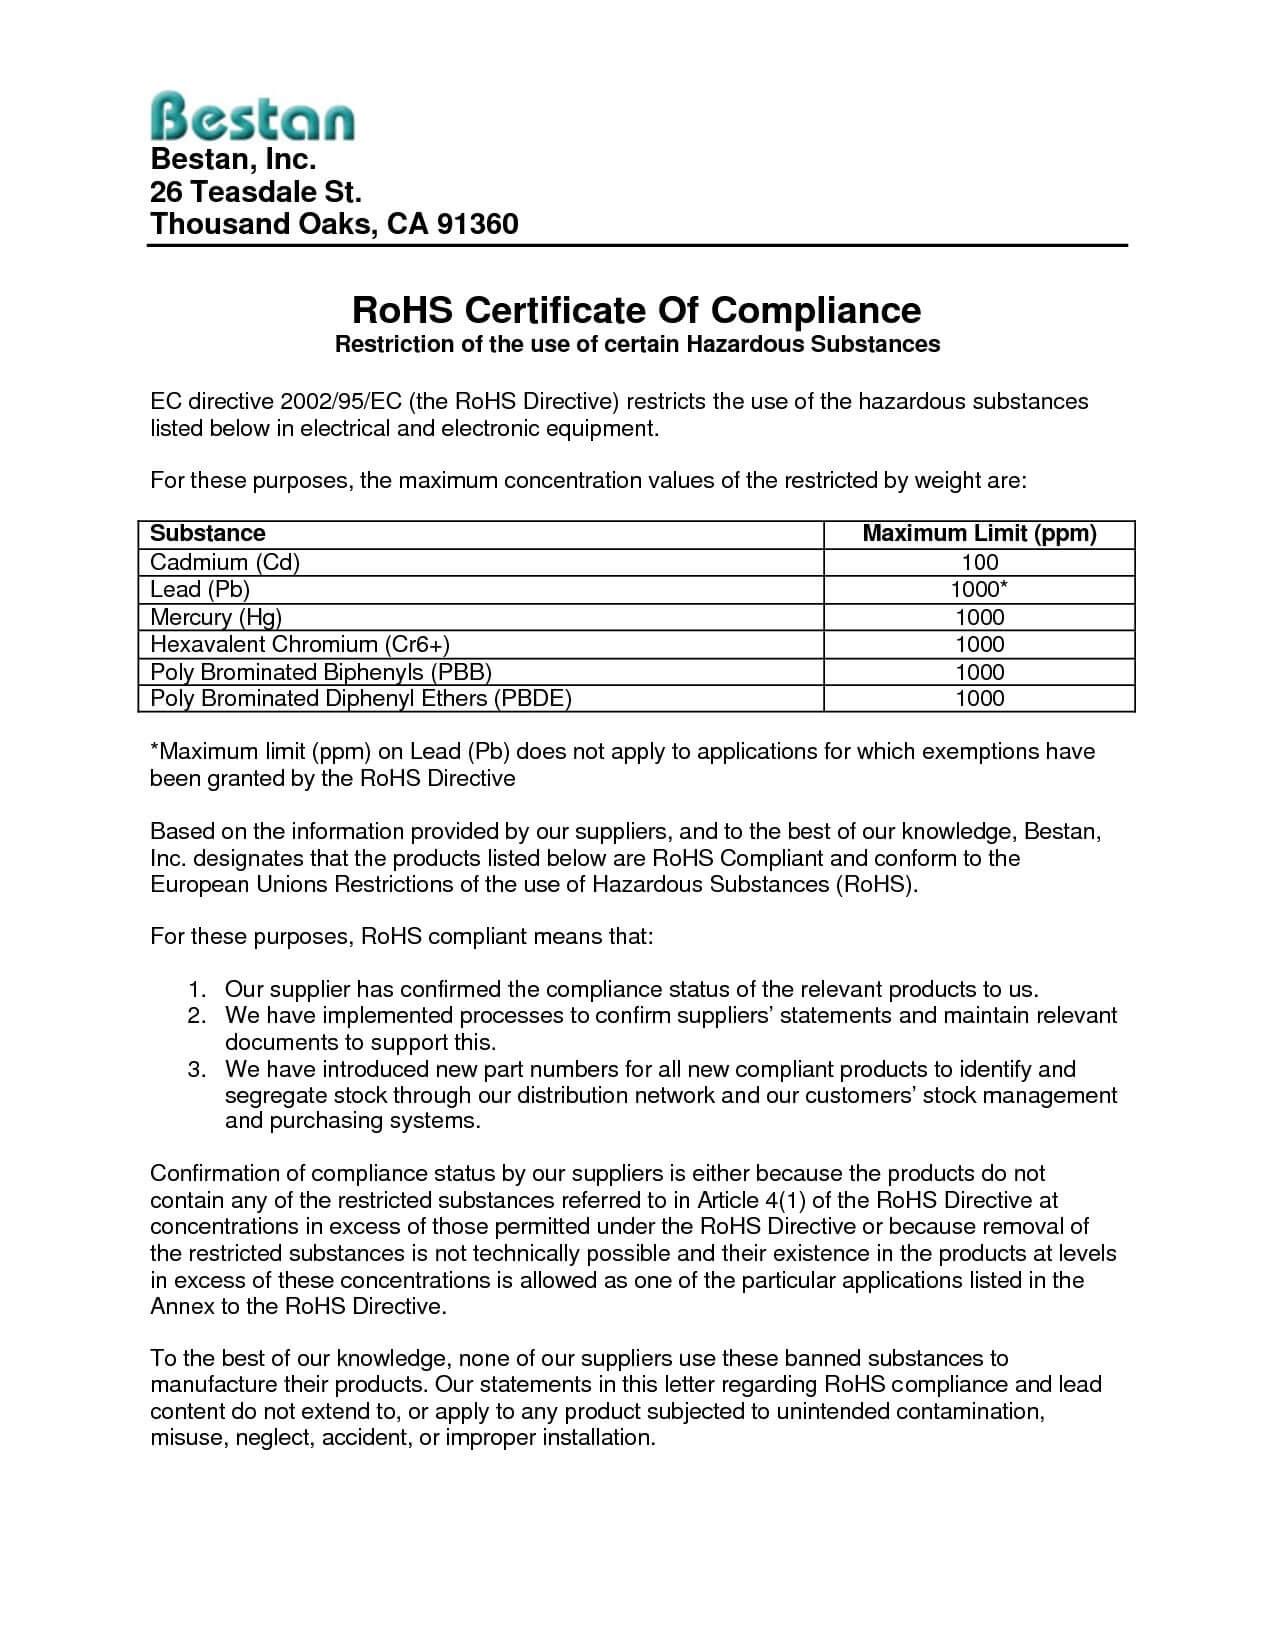 Reach Certificate Of Compliance Template Pliance Regarding Certificate Of Compliance Template